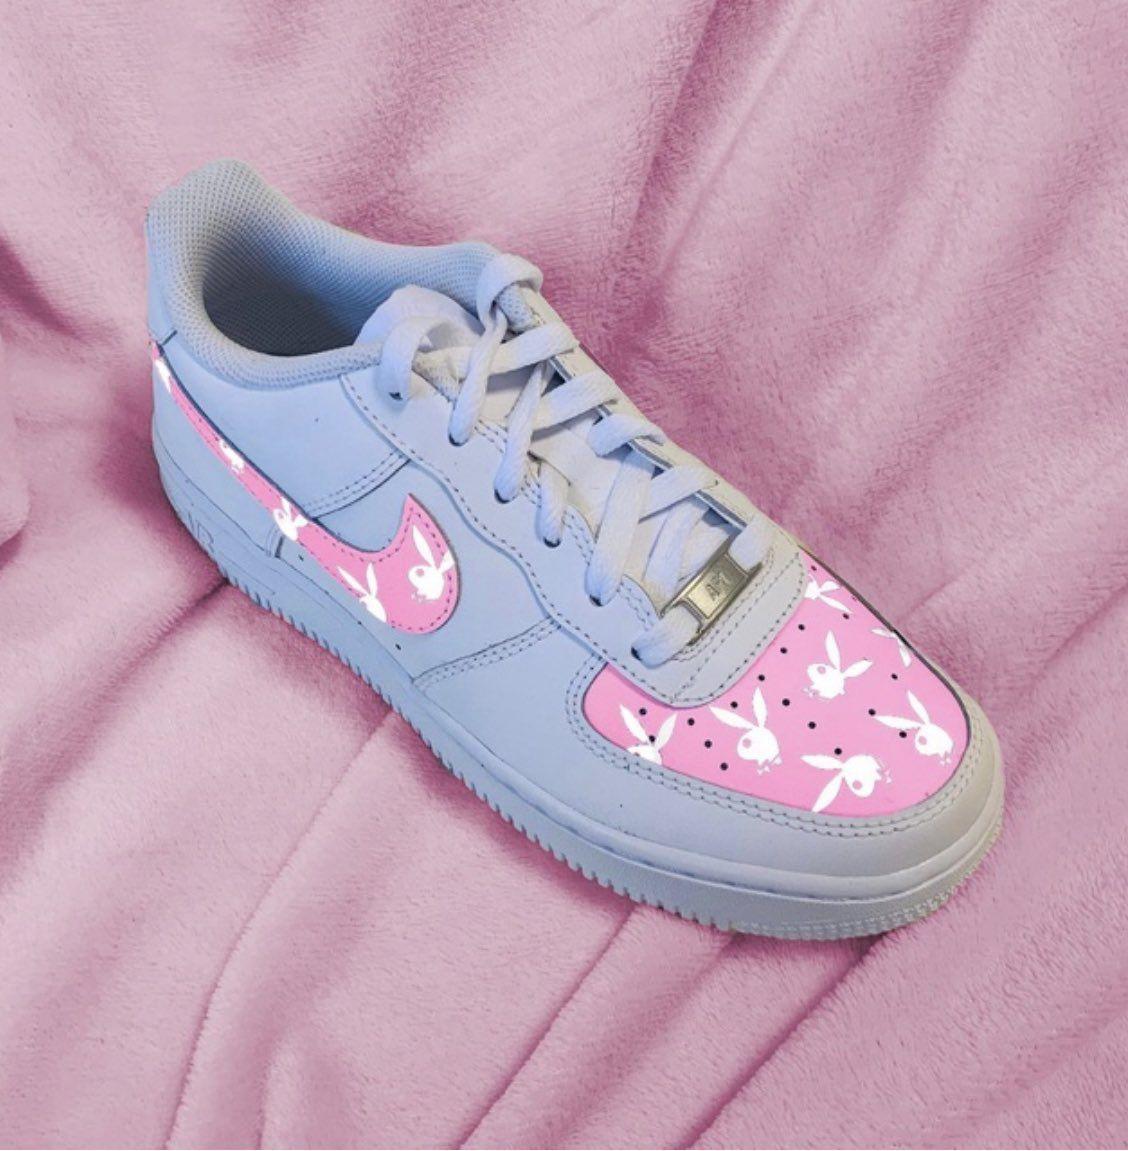 Pin by Blaxk Orion on Sneakers Yo! in 2020 White nike